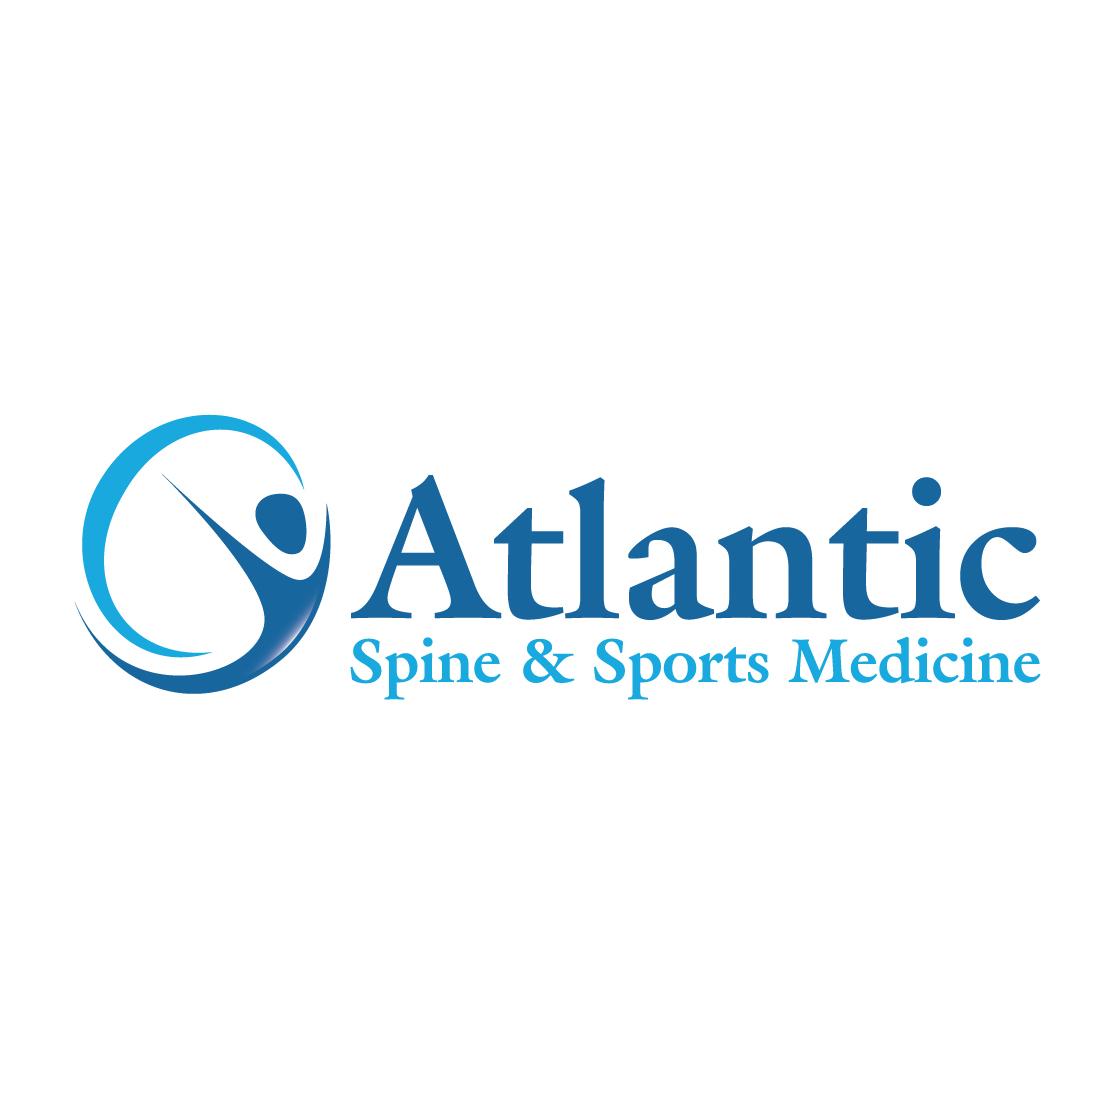 Atlantic Sports & Spine Medicine